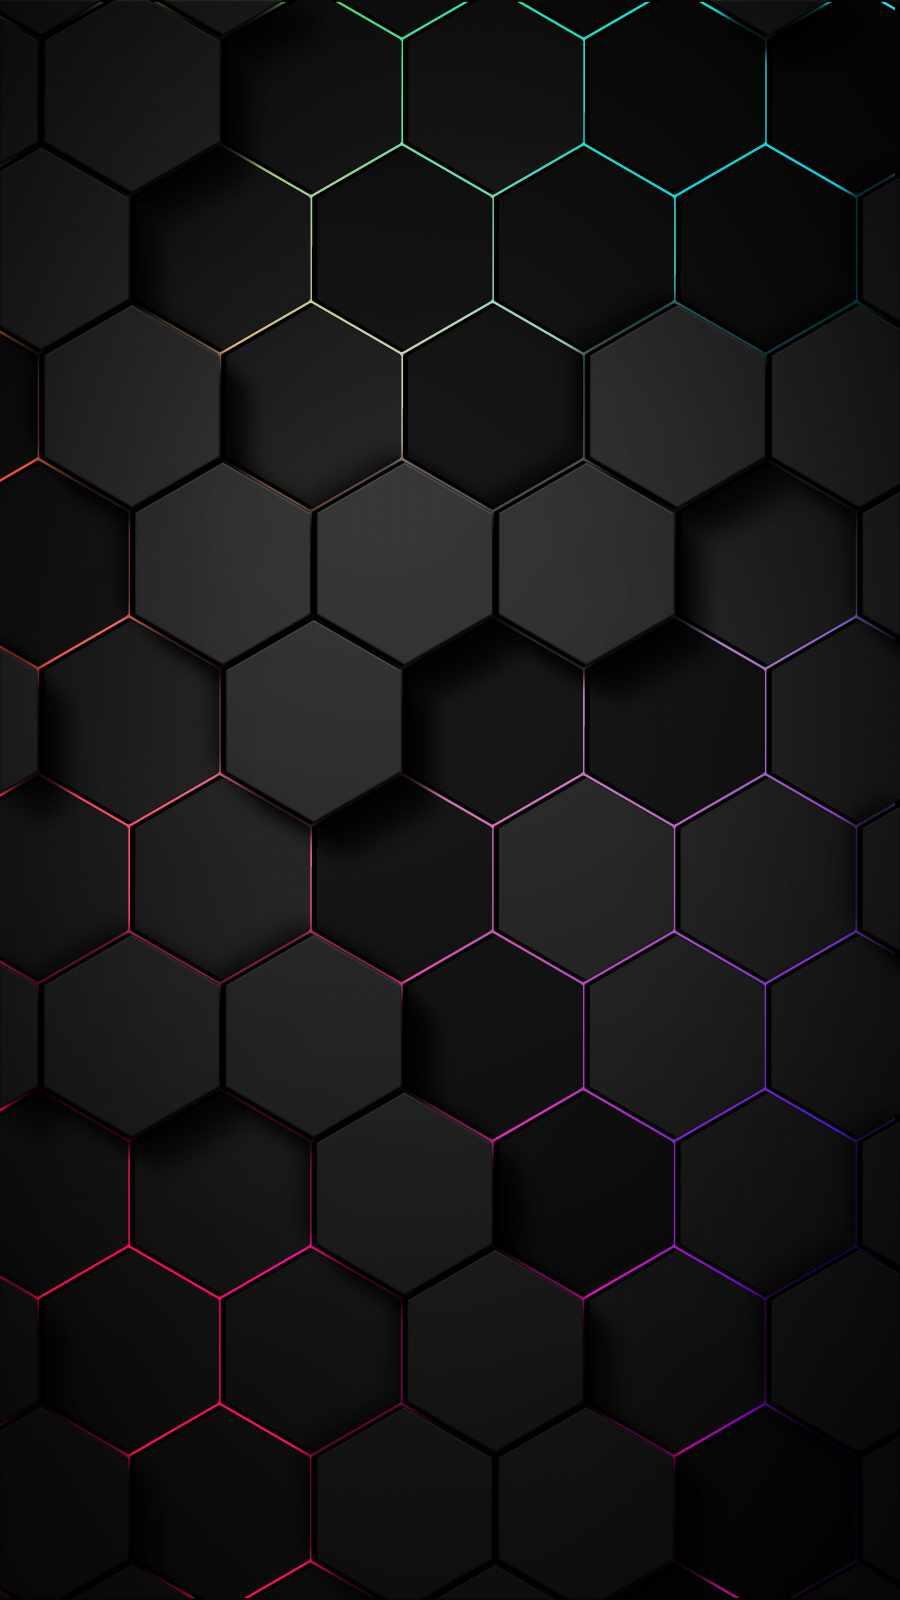 Hexagon 3D iPhone Wallpaper